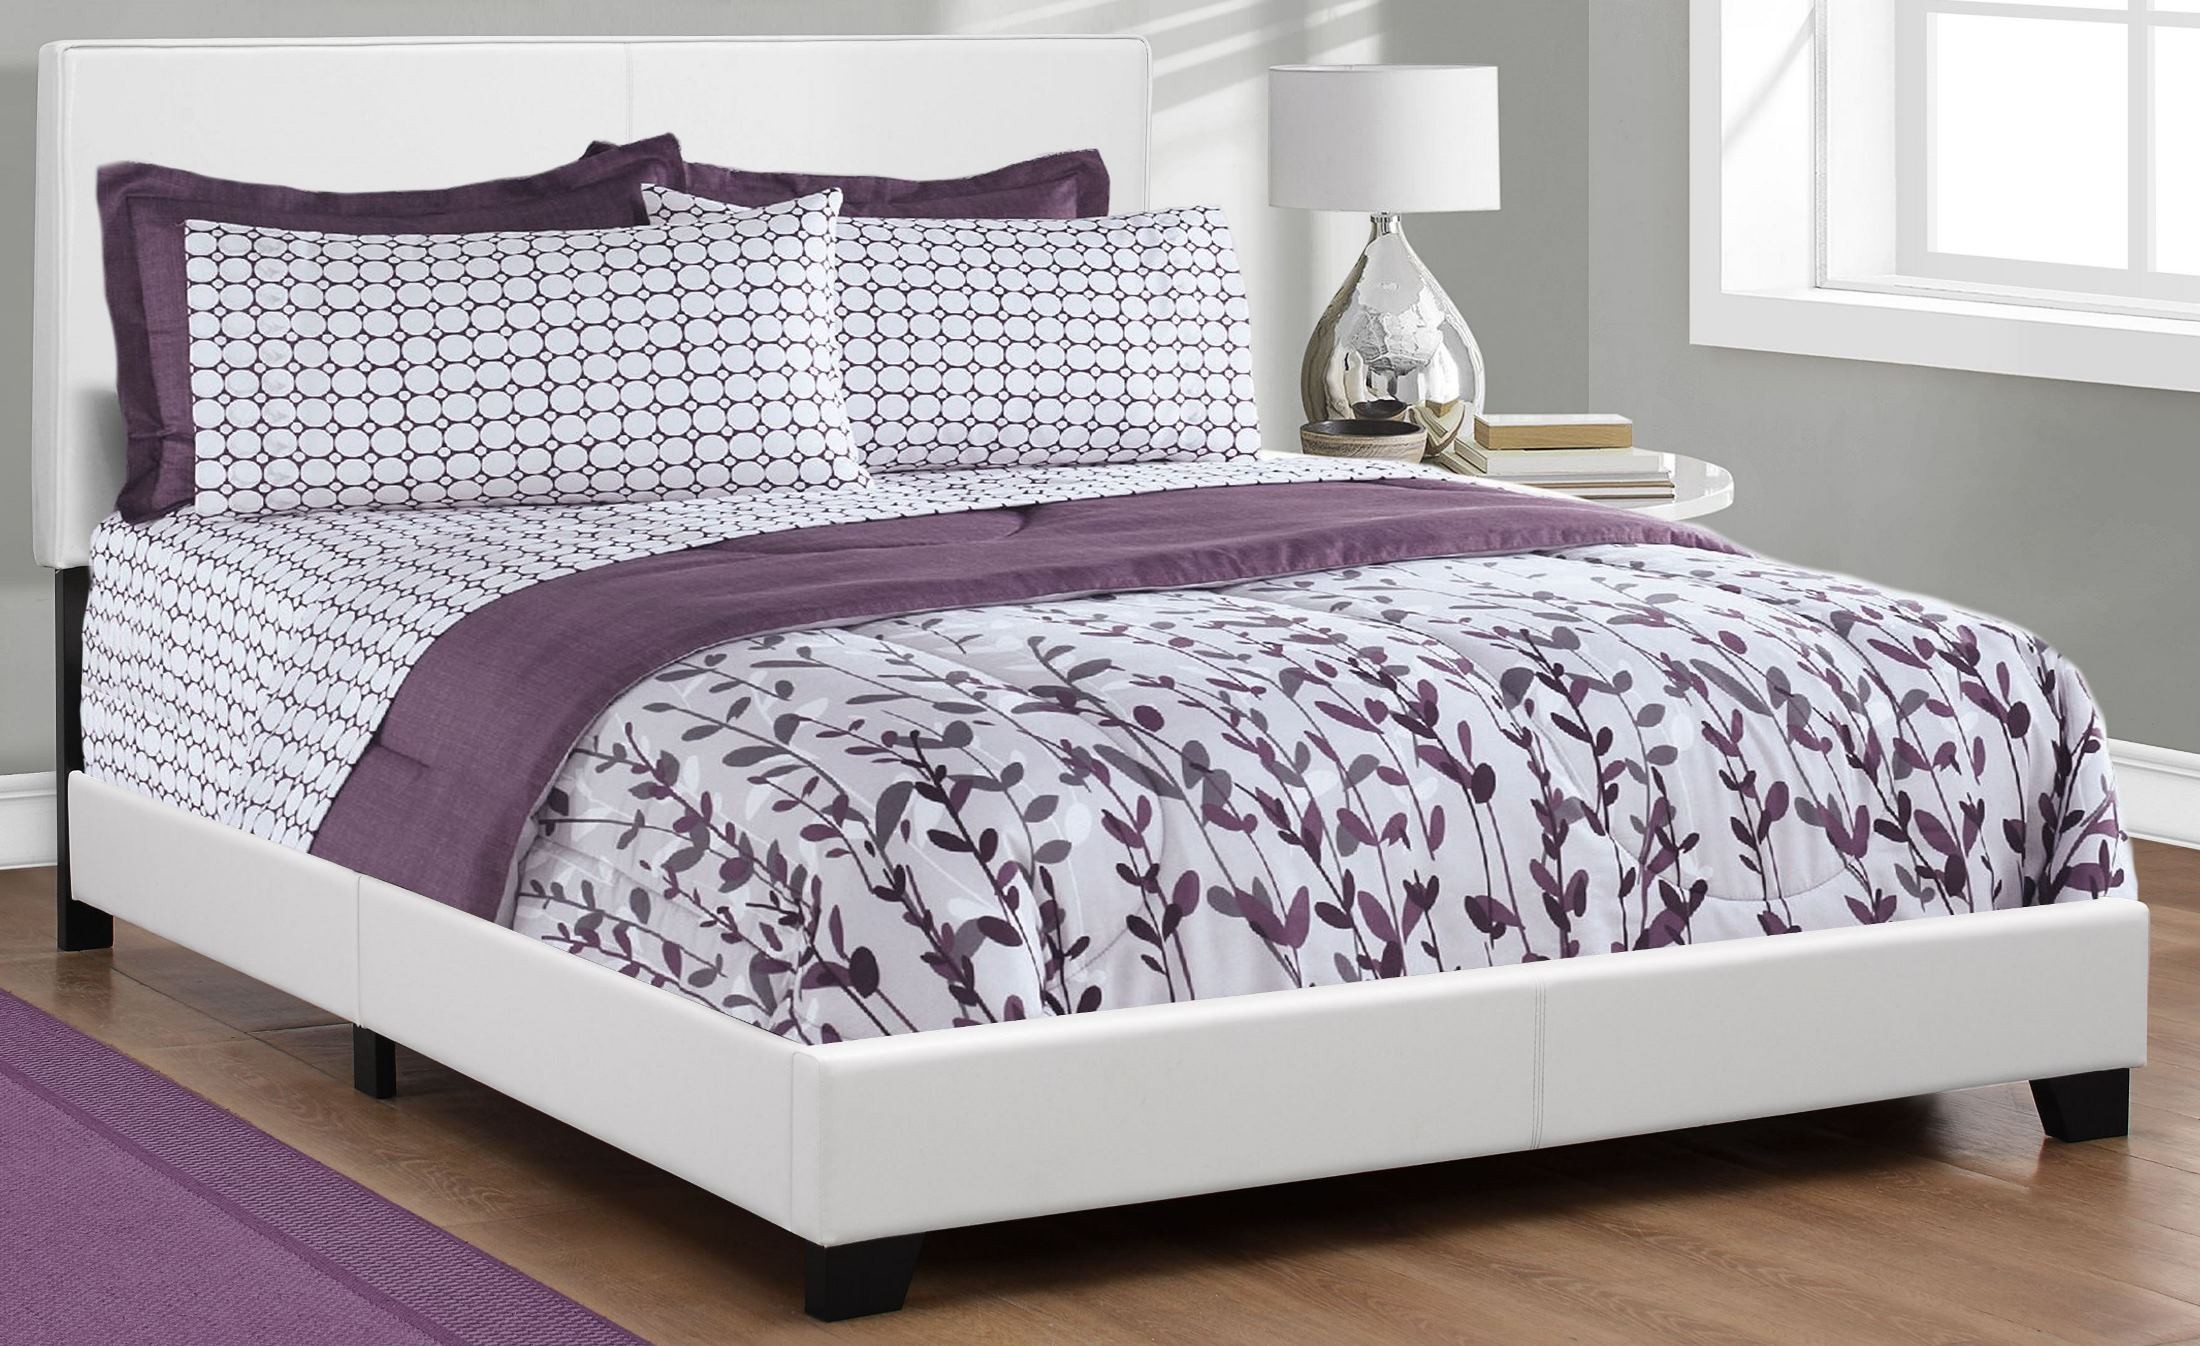 Queen white platform bed from monarch coleman furniture - White queen platform bedroom set ...